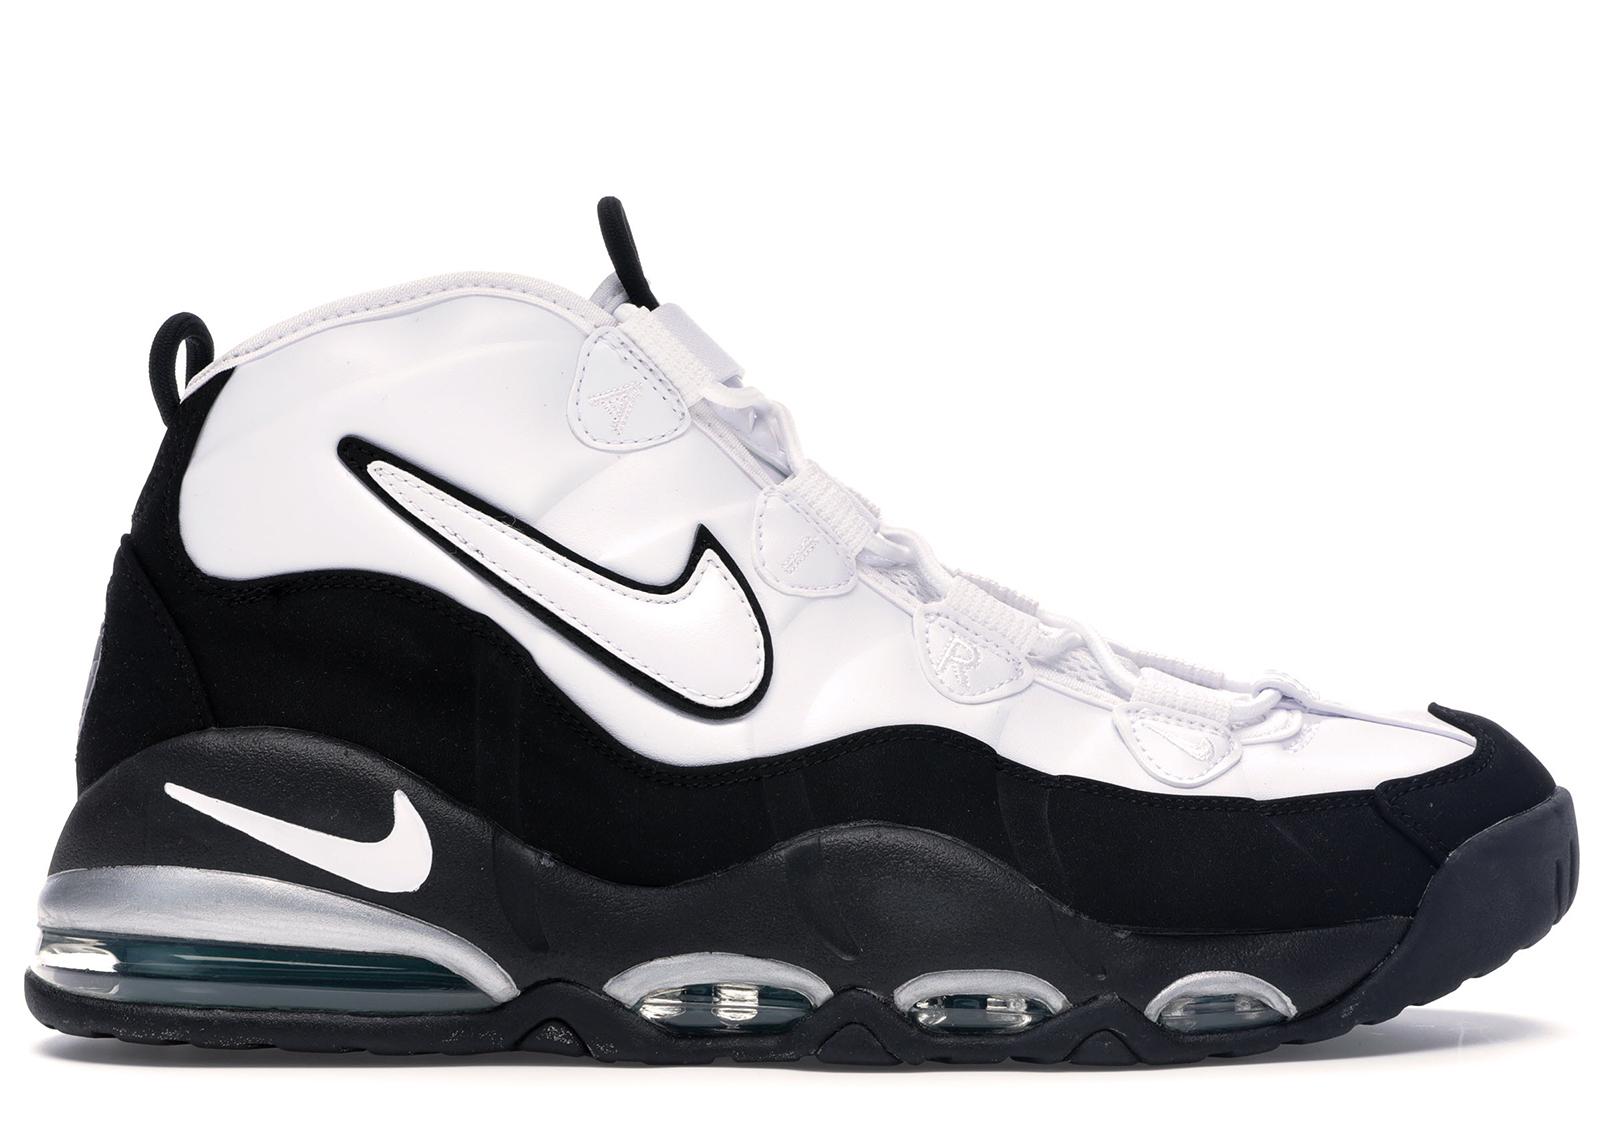 Nike Air Max Uptempo 95 White Black Teal (2011/2015)